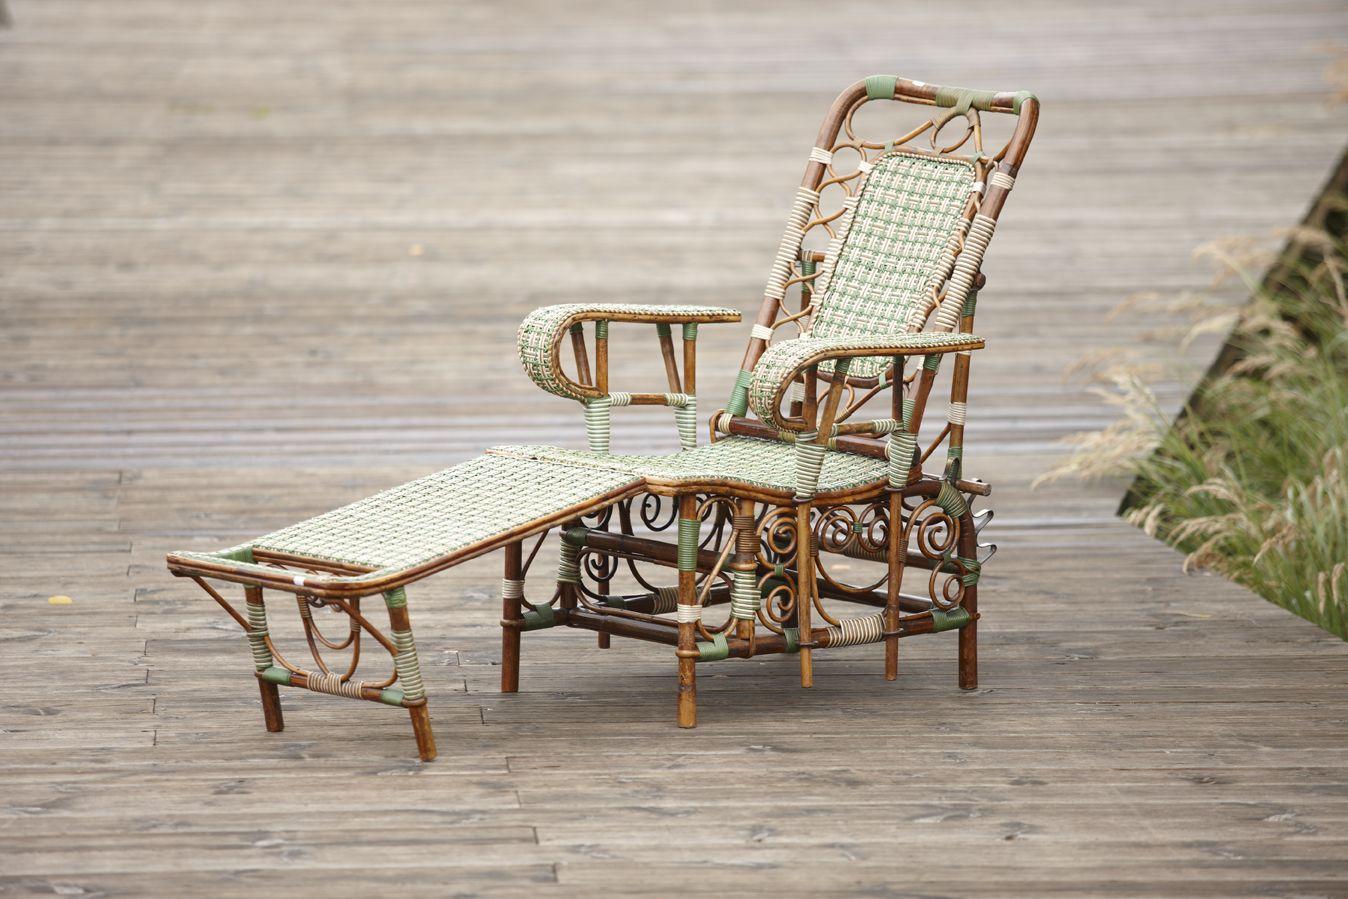 Chaise Longue En Rotin Manufacture Perret Vibert C1889 1890 Galerie